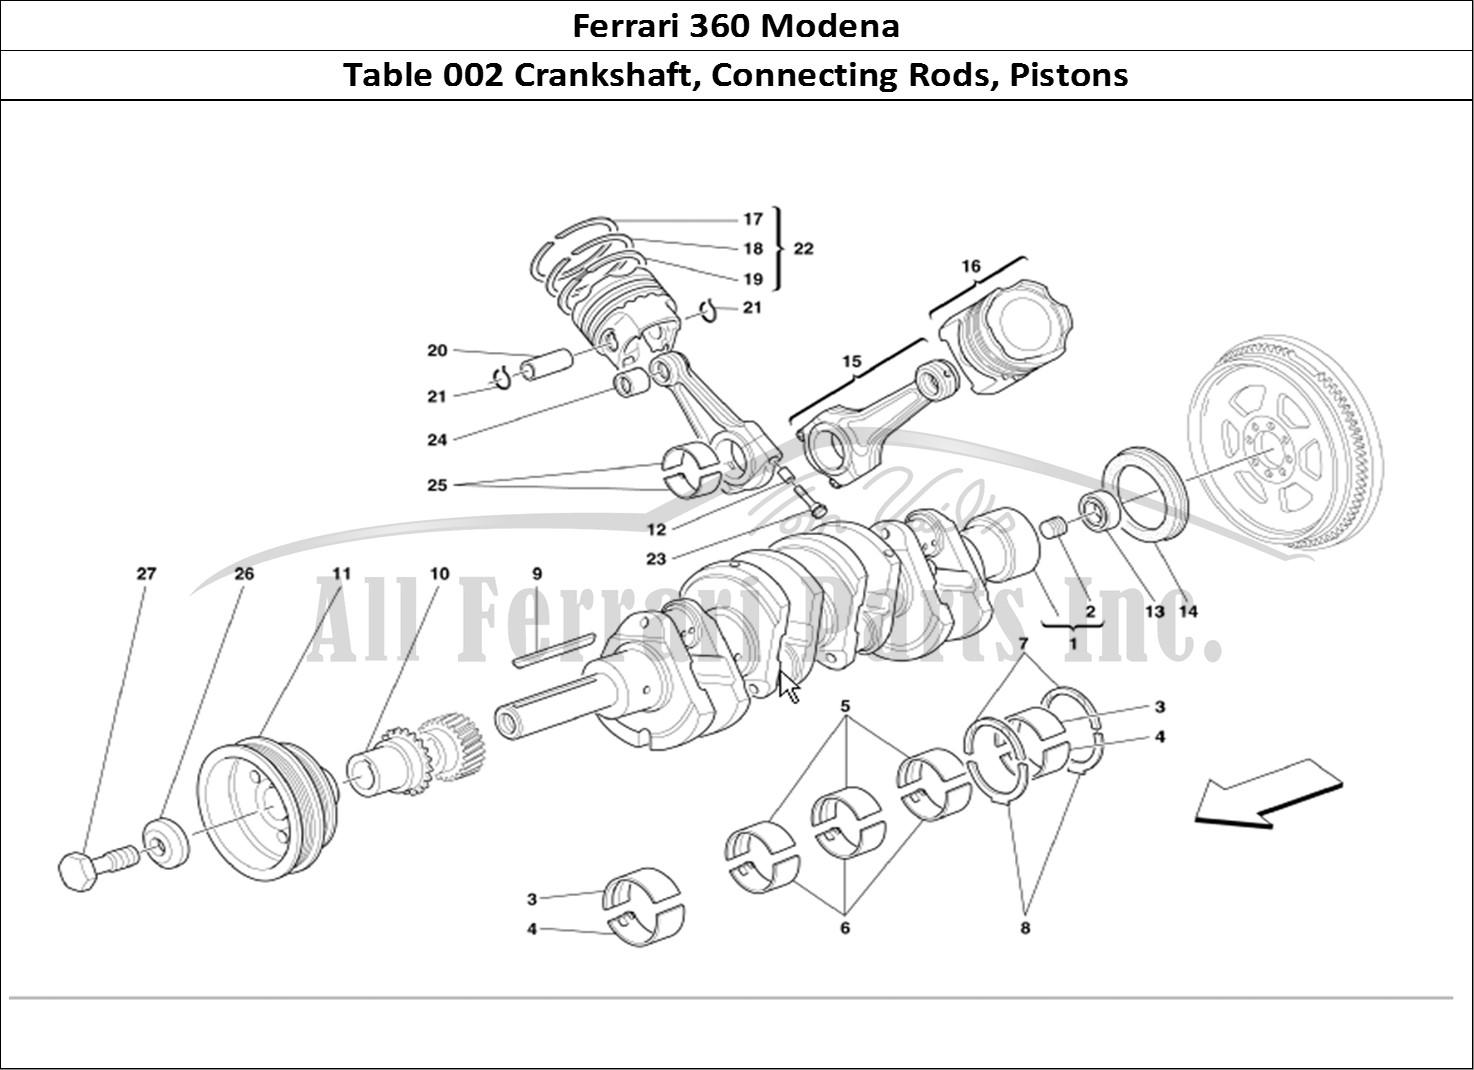 Buy Original Ferrari 360 Modena 002 Crankshaft Connecting